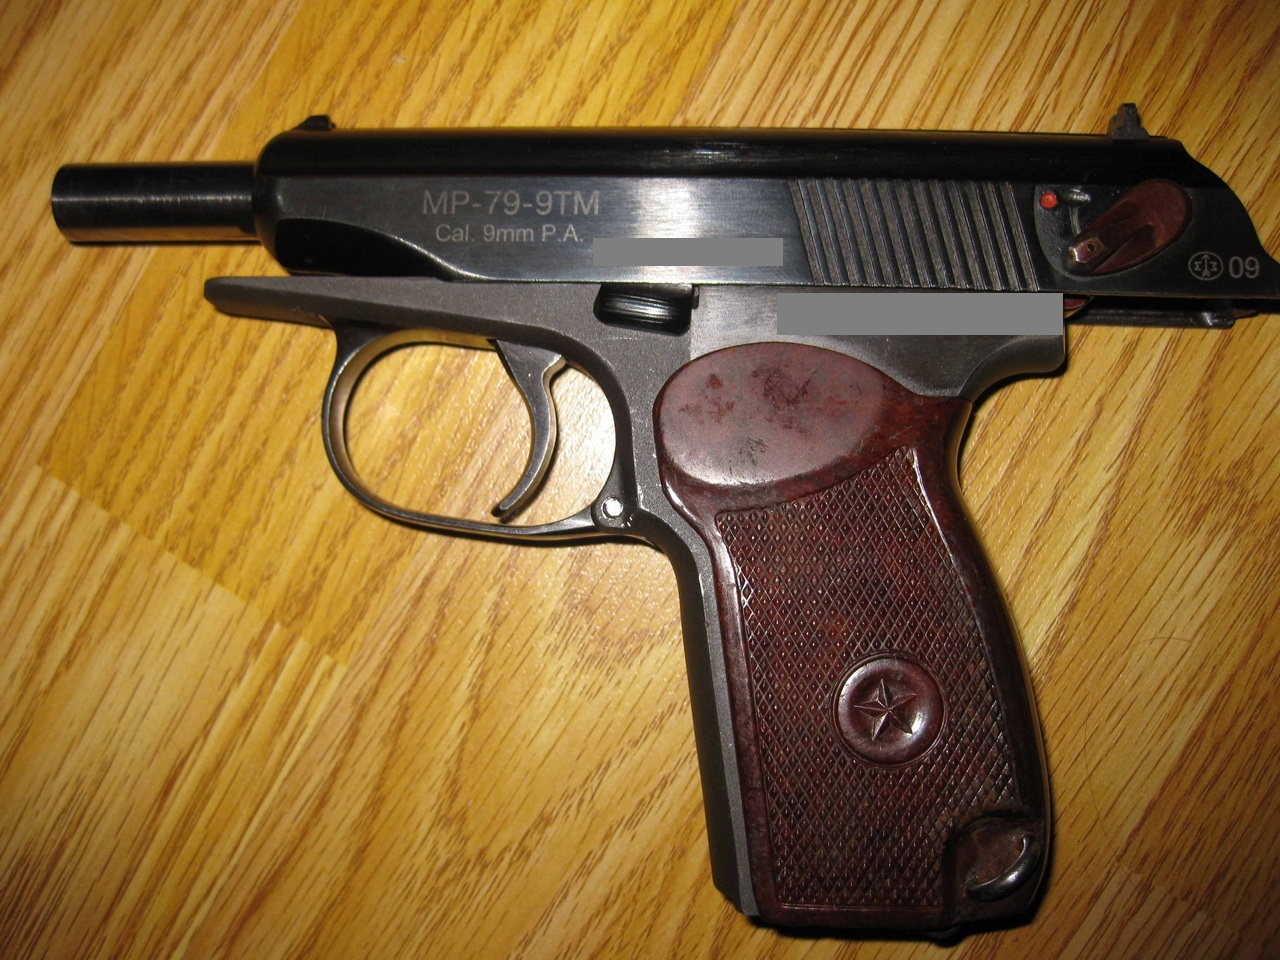 ВСамаре мужчина отобрал упенсионера травматический пистолет